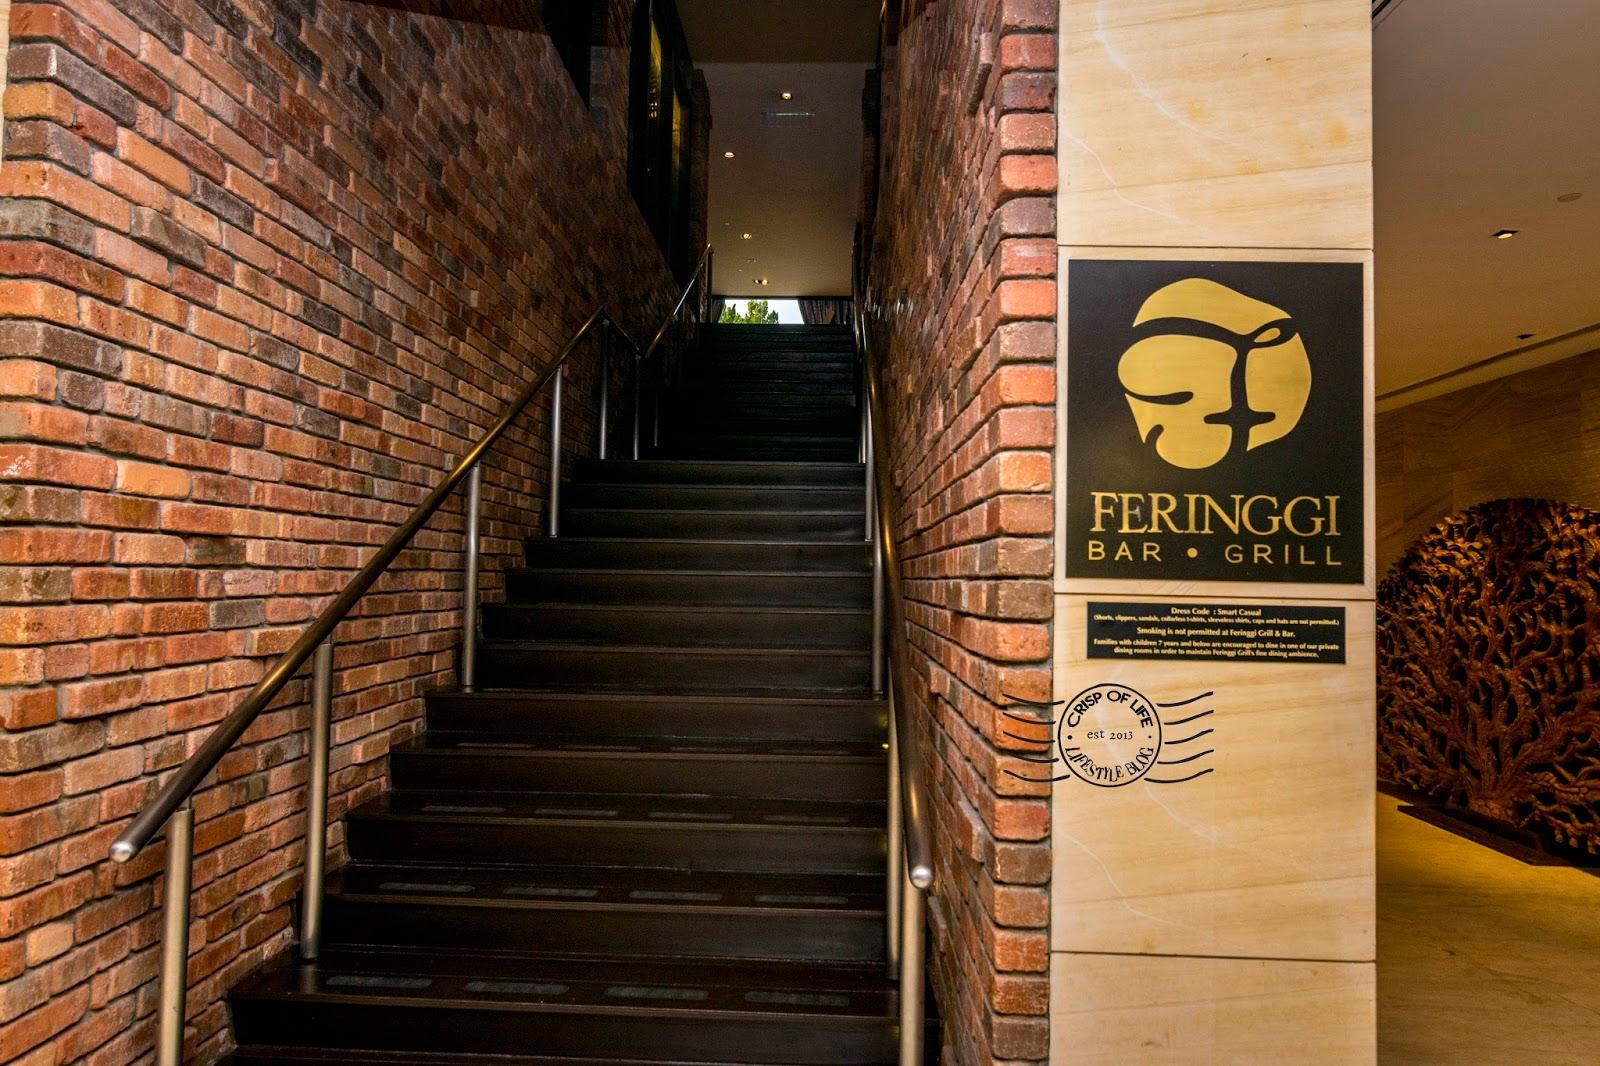 Feringgi Bar & Grill Awarded Malaysia Tourism Award 2016/2017